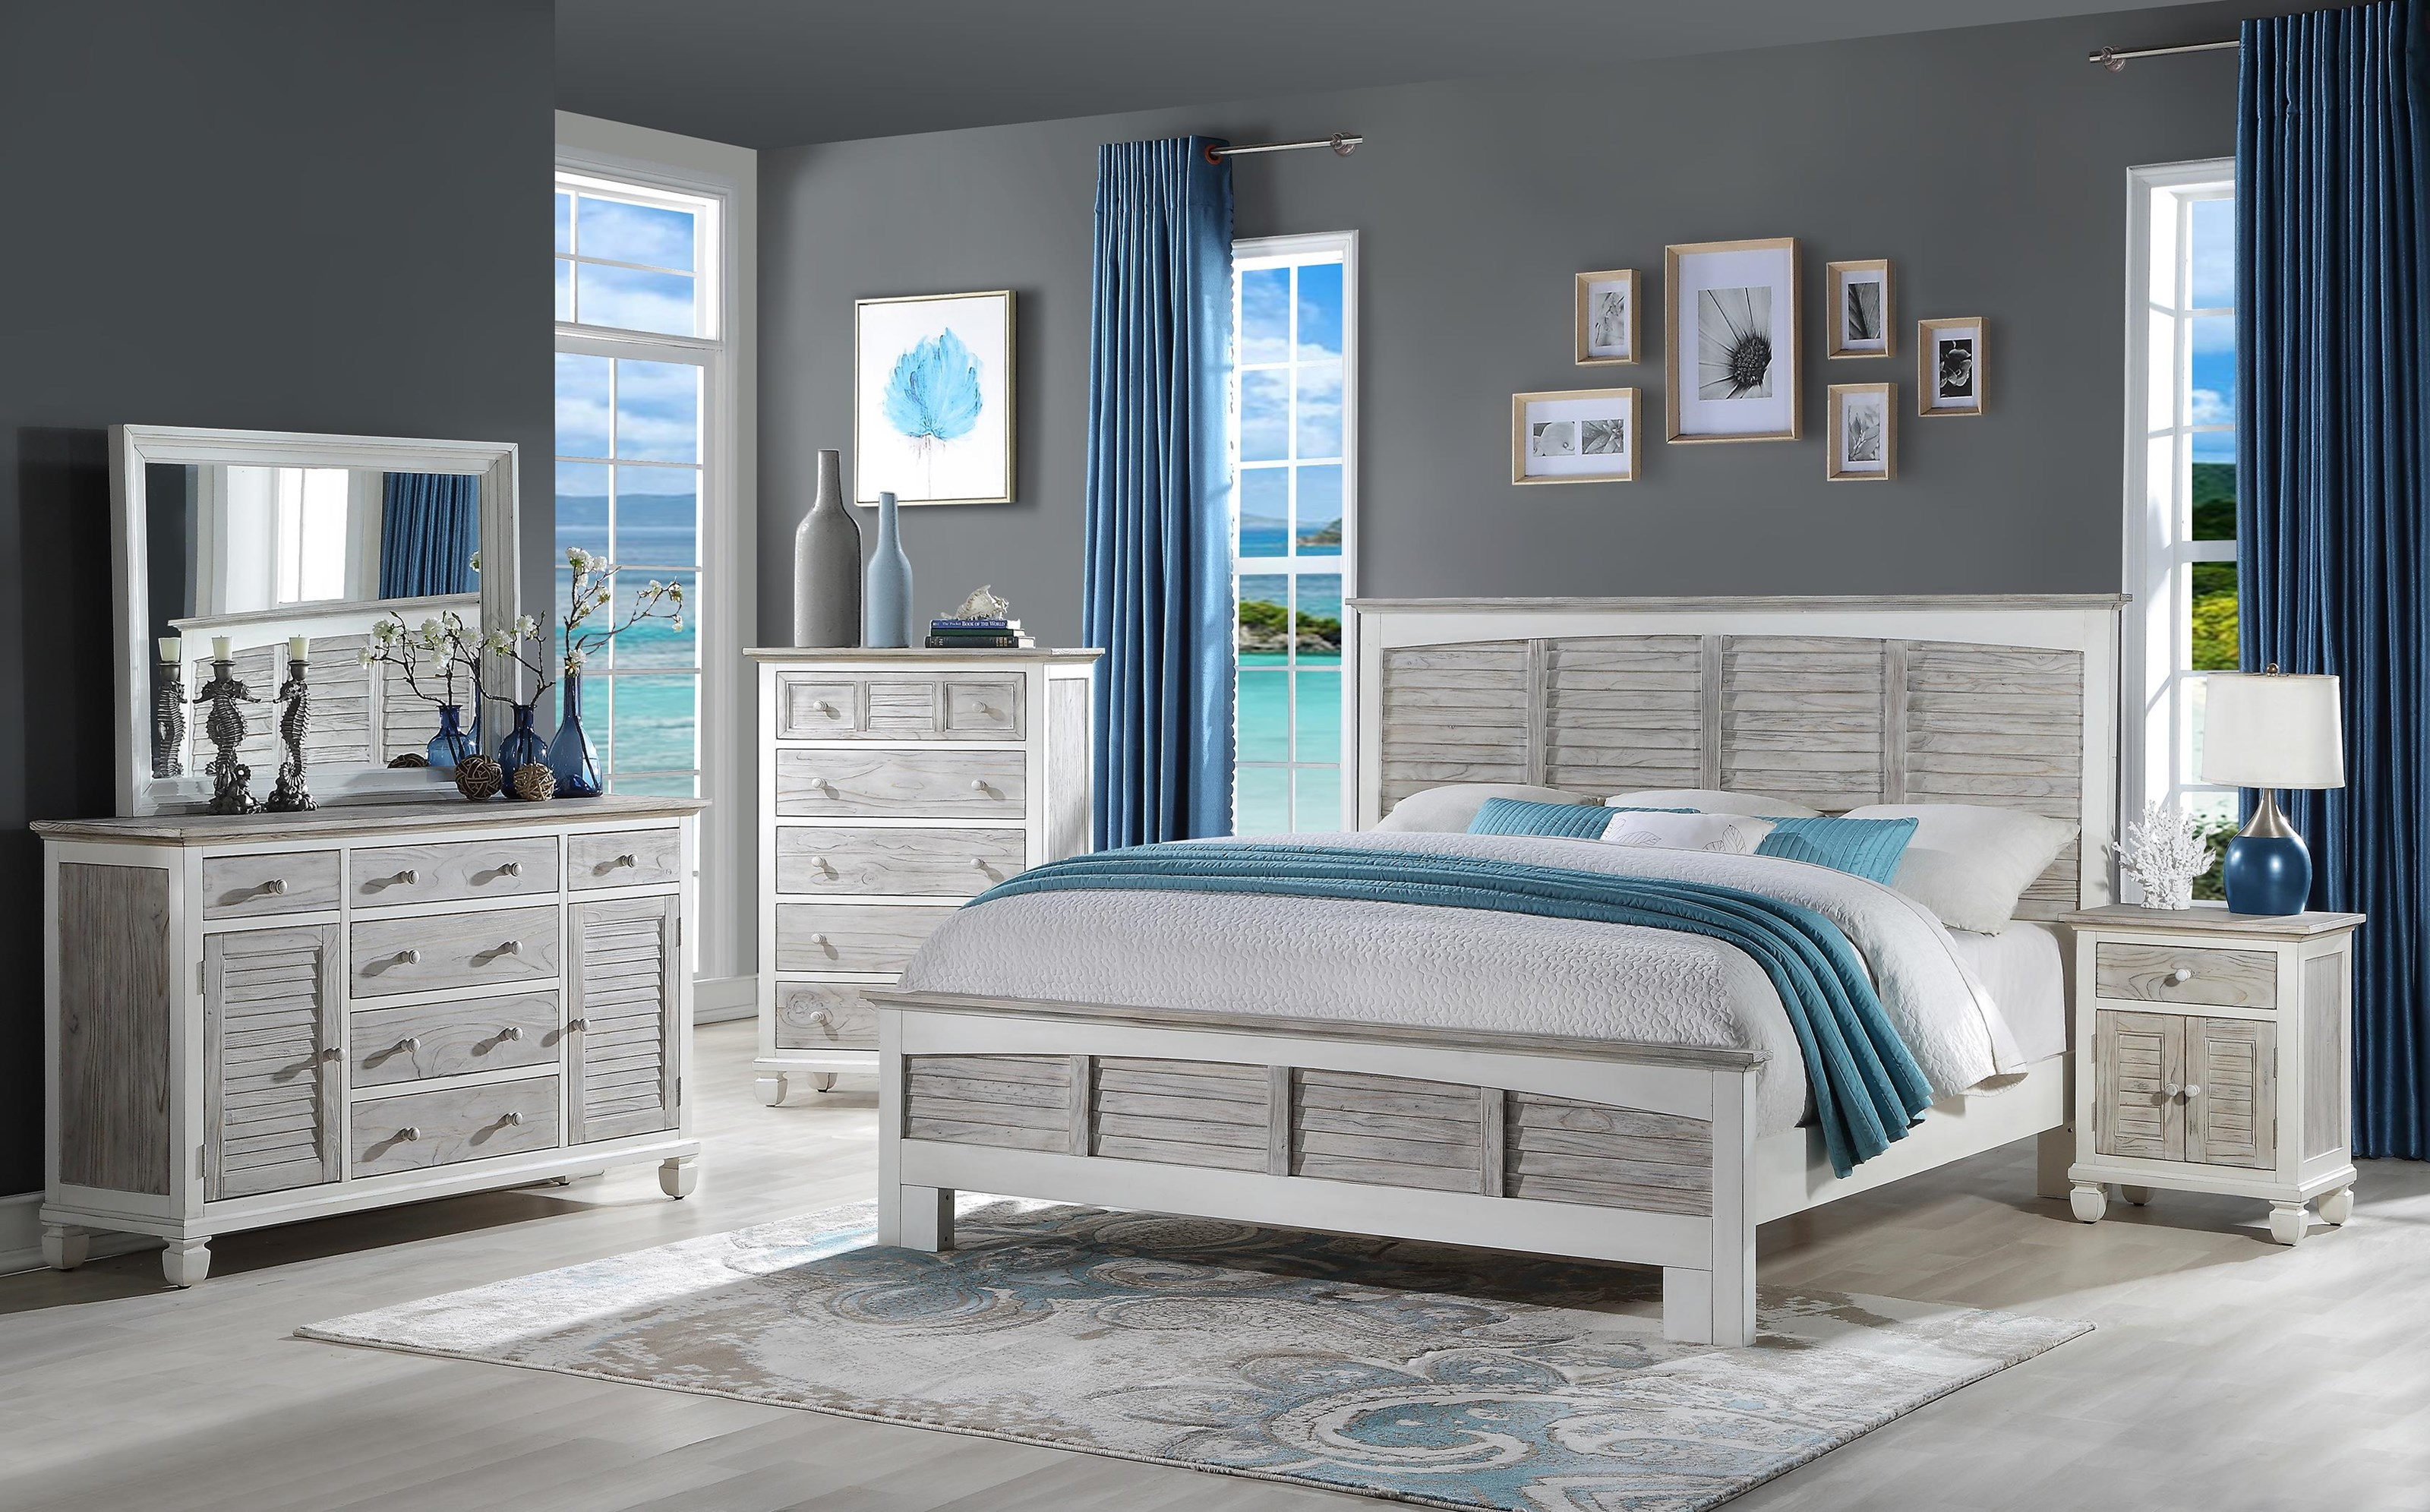 islamorada Queen bedroom group by Sea Winds Trading Company at Johnny Janosik